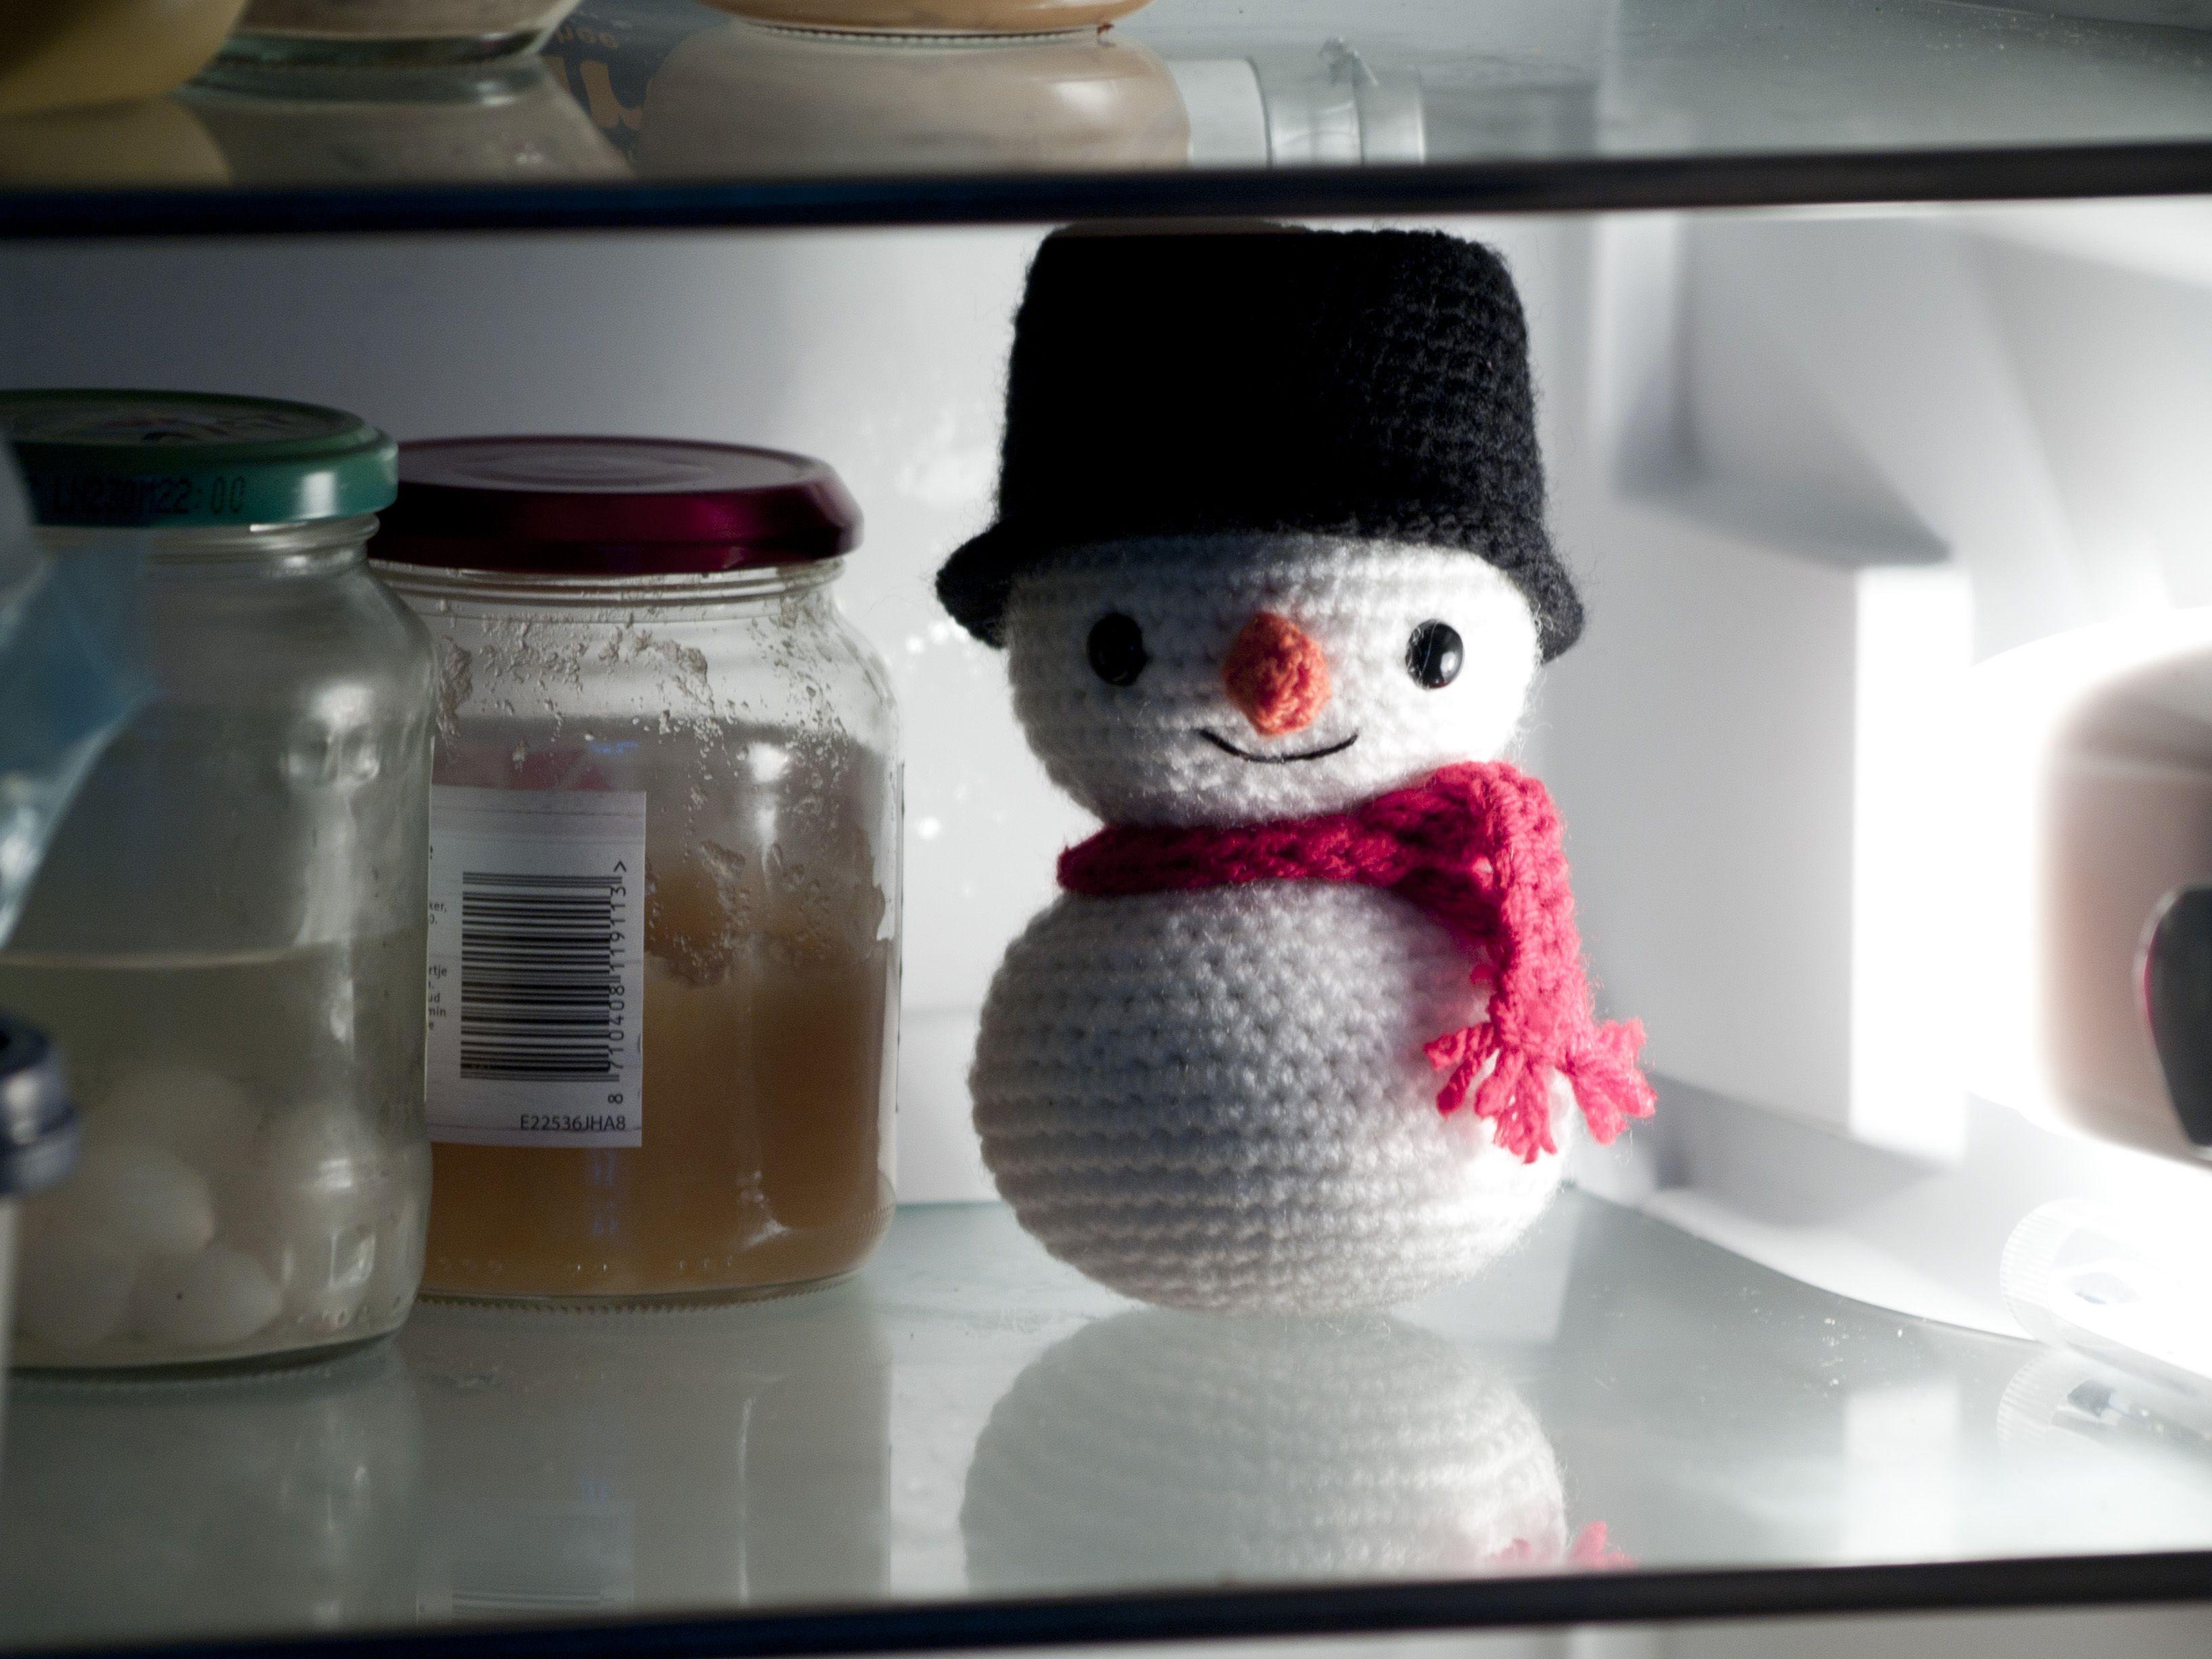 Amigurumi Snowman : Amigurumi snowman amigurumiwizard crochet pattern amigurumi